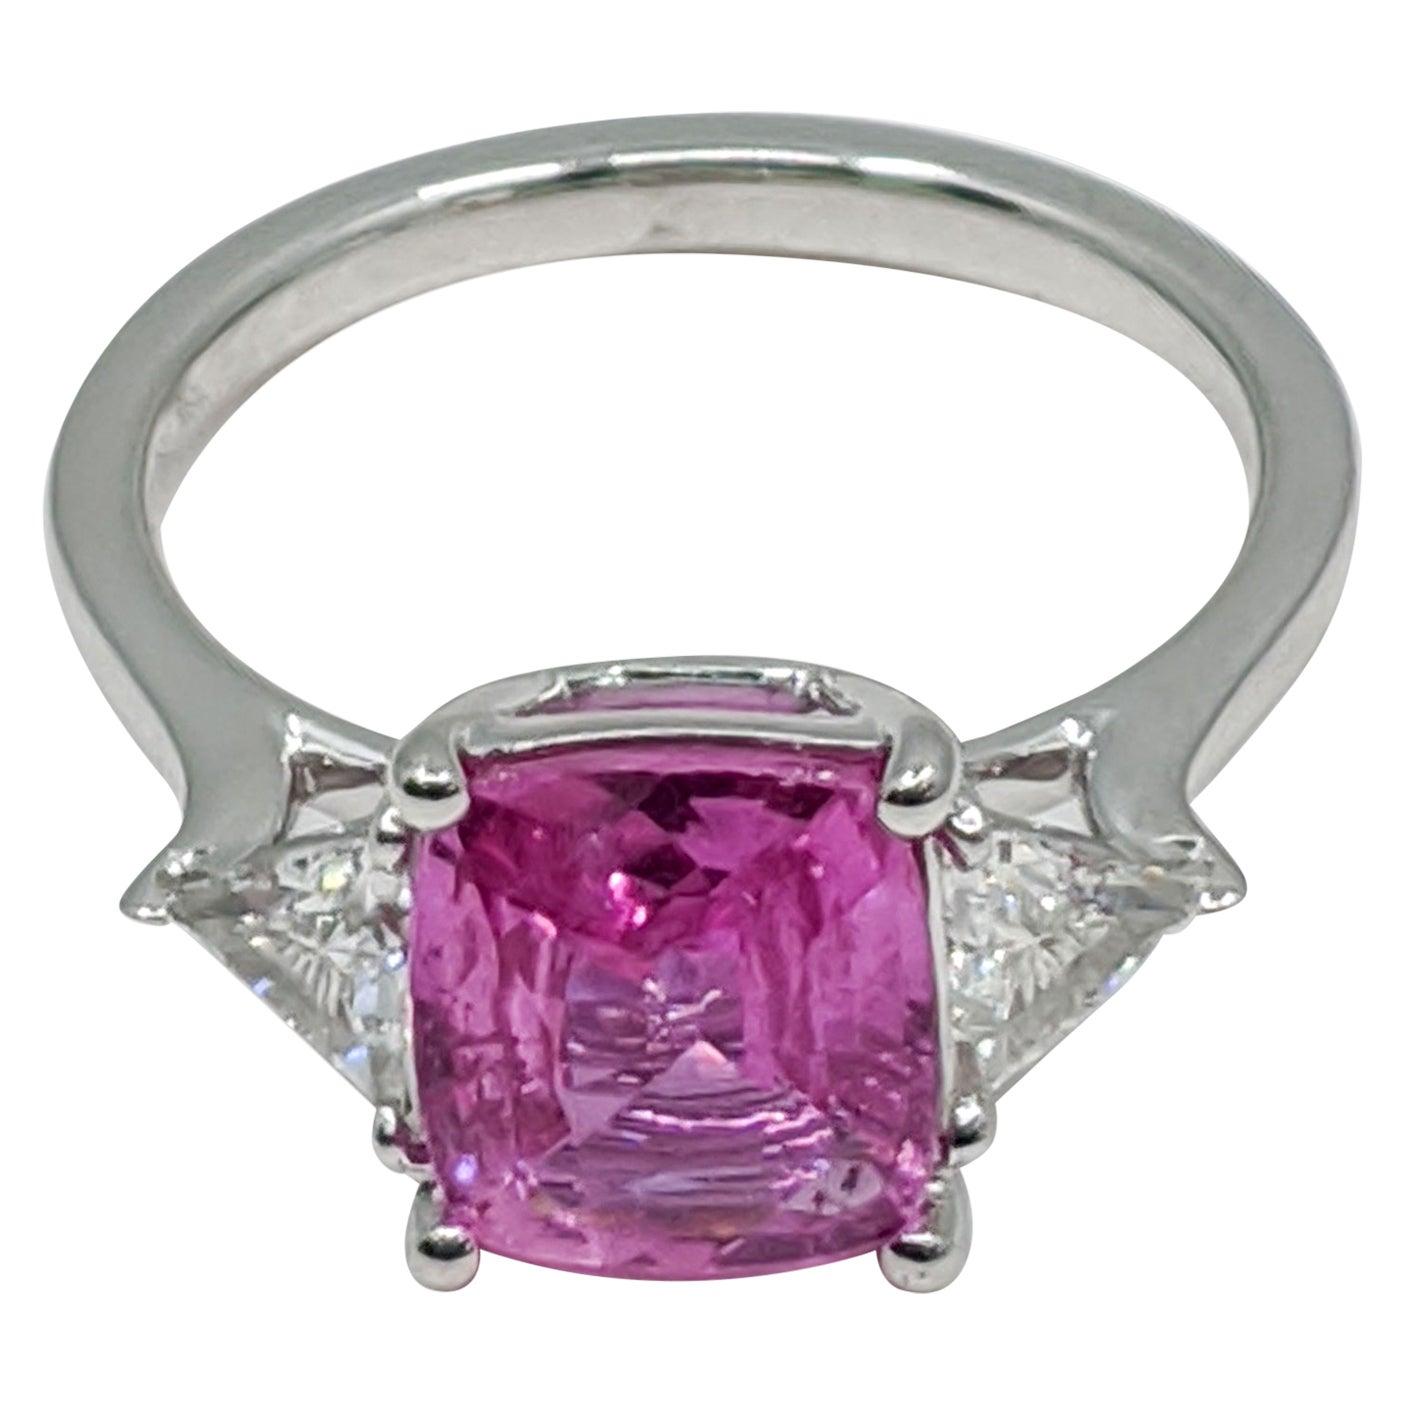 3-Stone Pink Sapphire/White Diamond Engagement Ring, 18 Carat